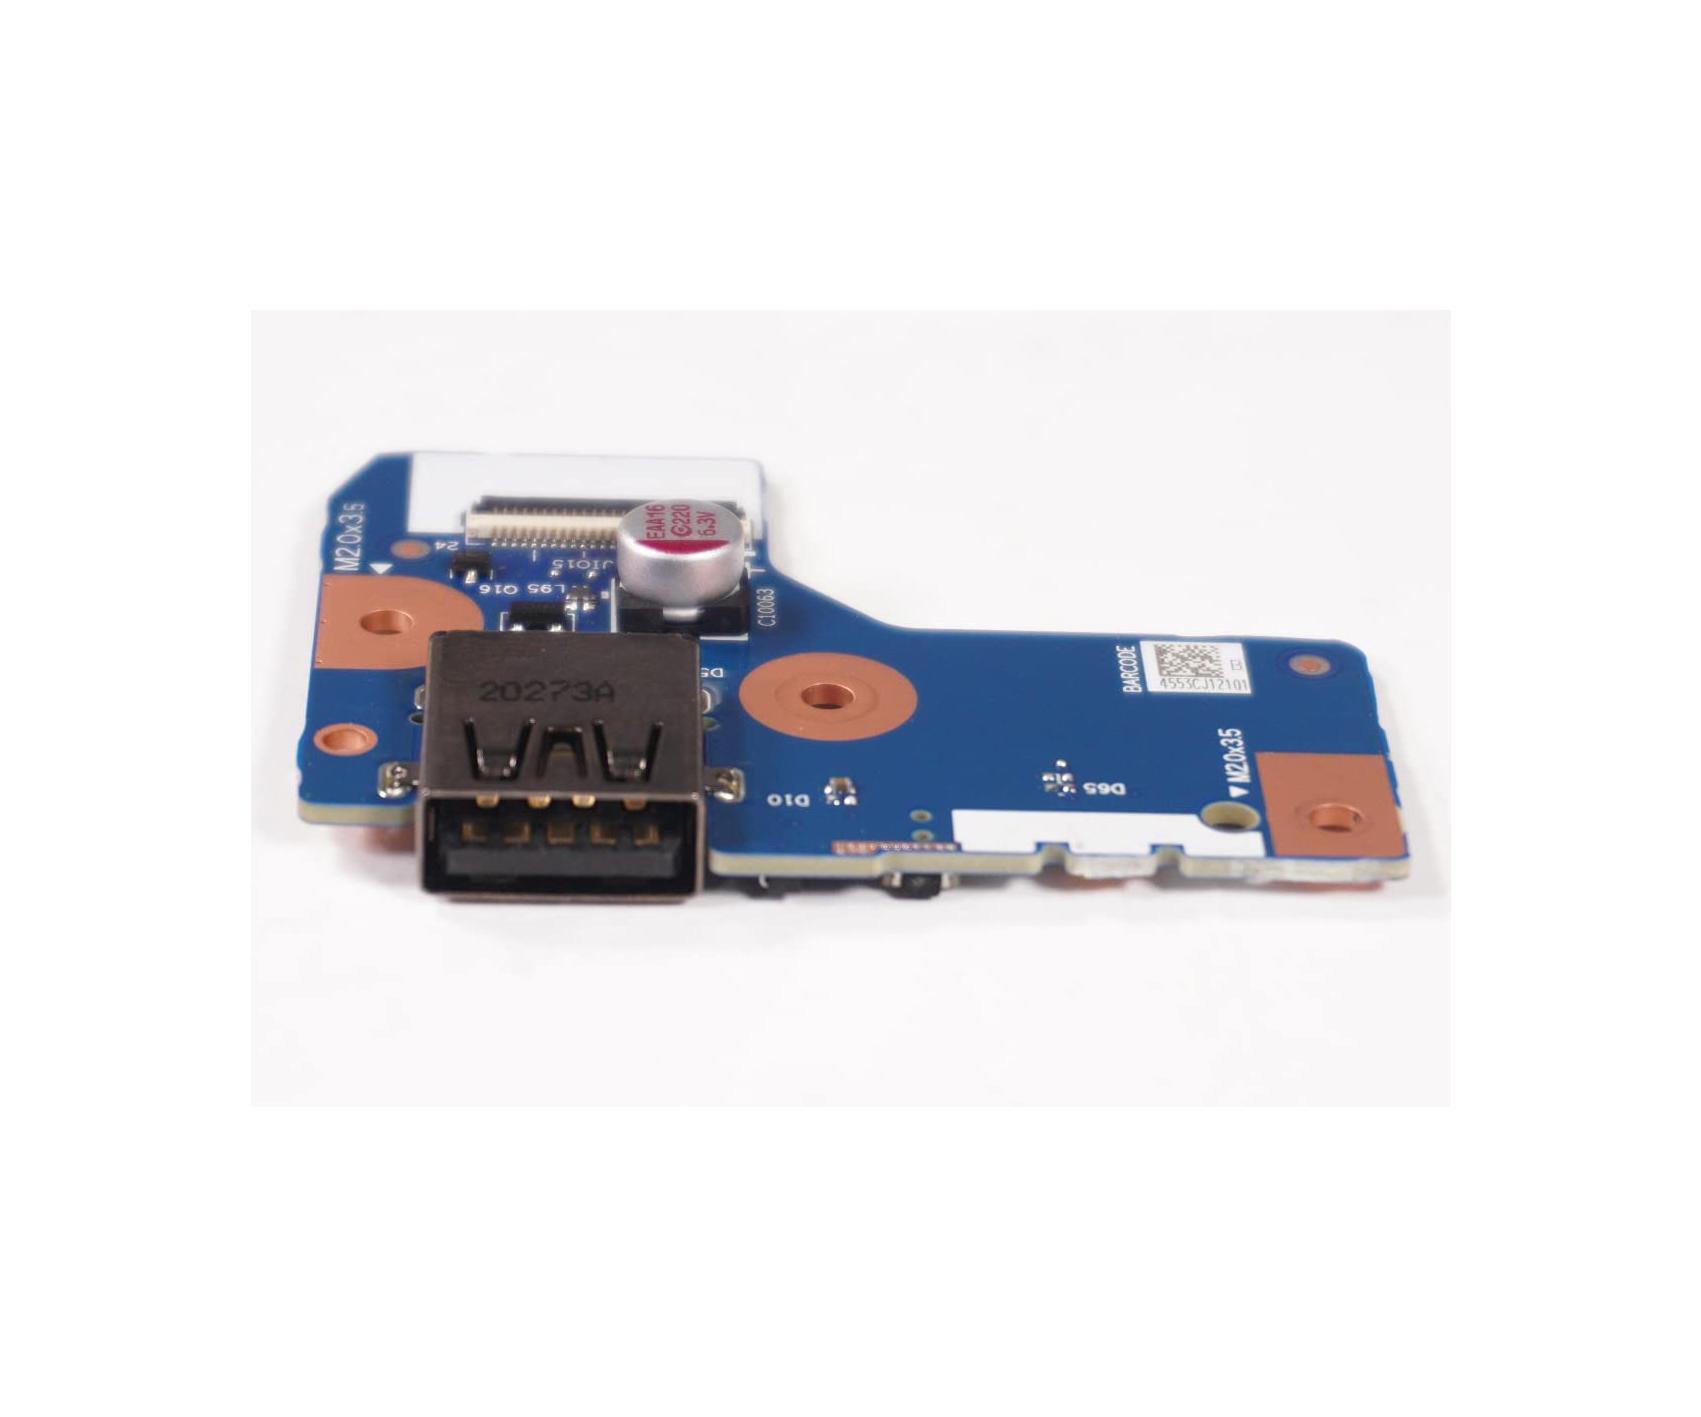 Lenovo Legion 5 Laptop USB Board Replacement (5C50S25069)